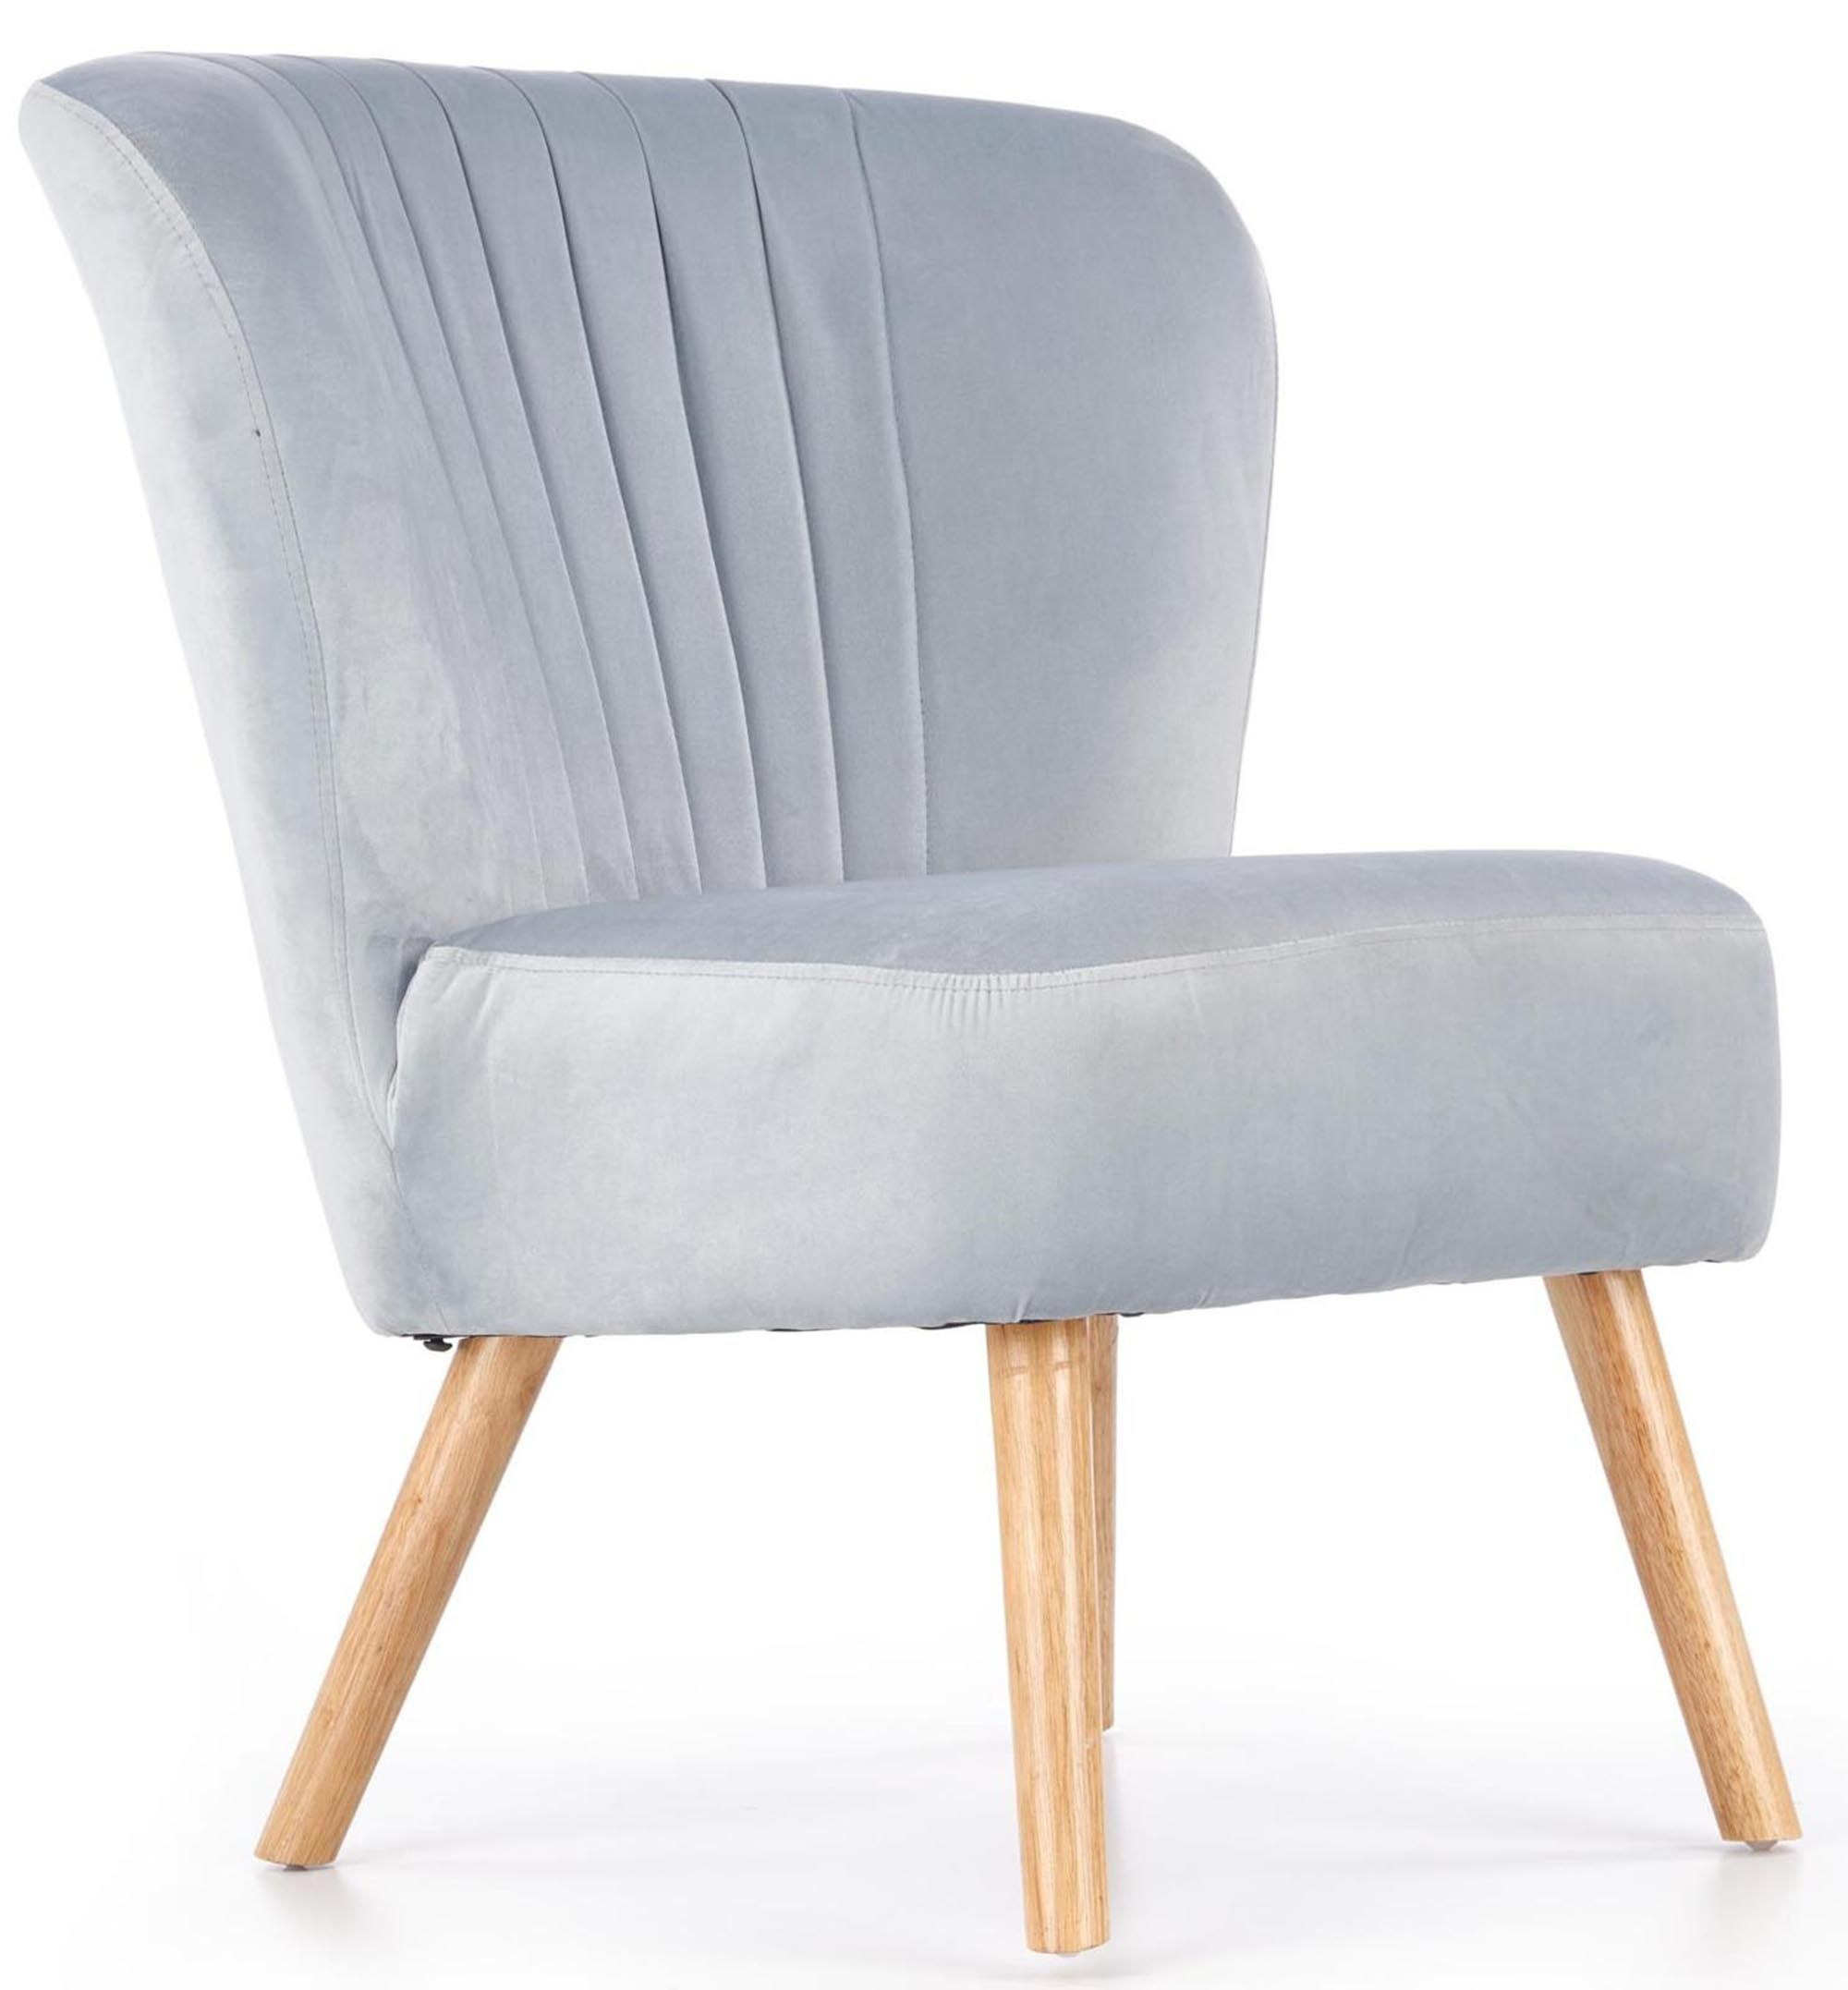 Fotel Do Salonu Elegancki Jasny Popiel Welur 7367169081